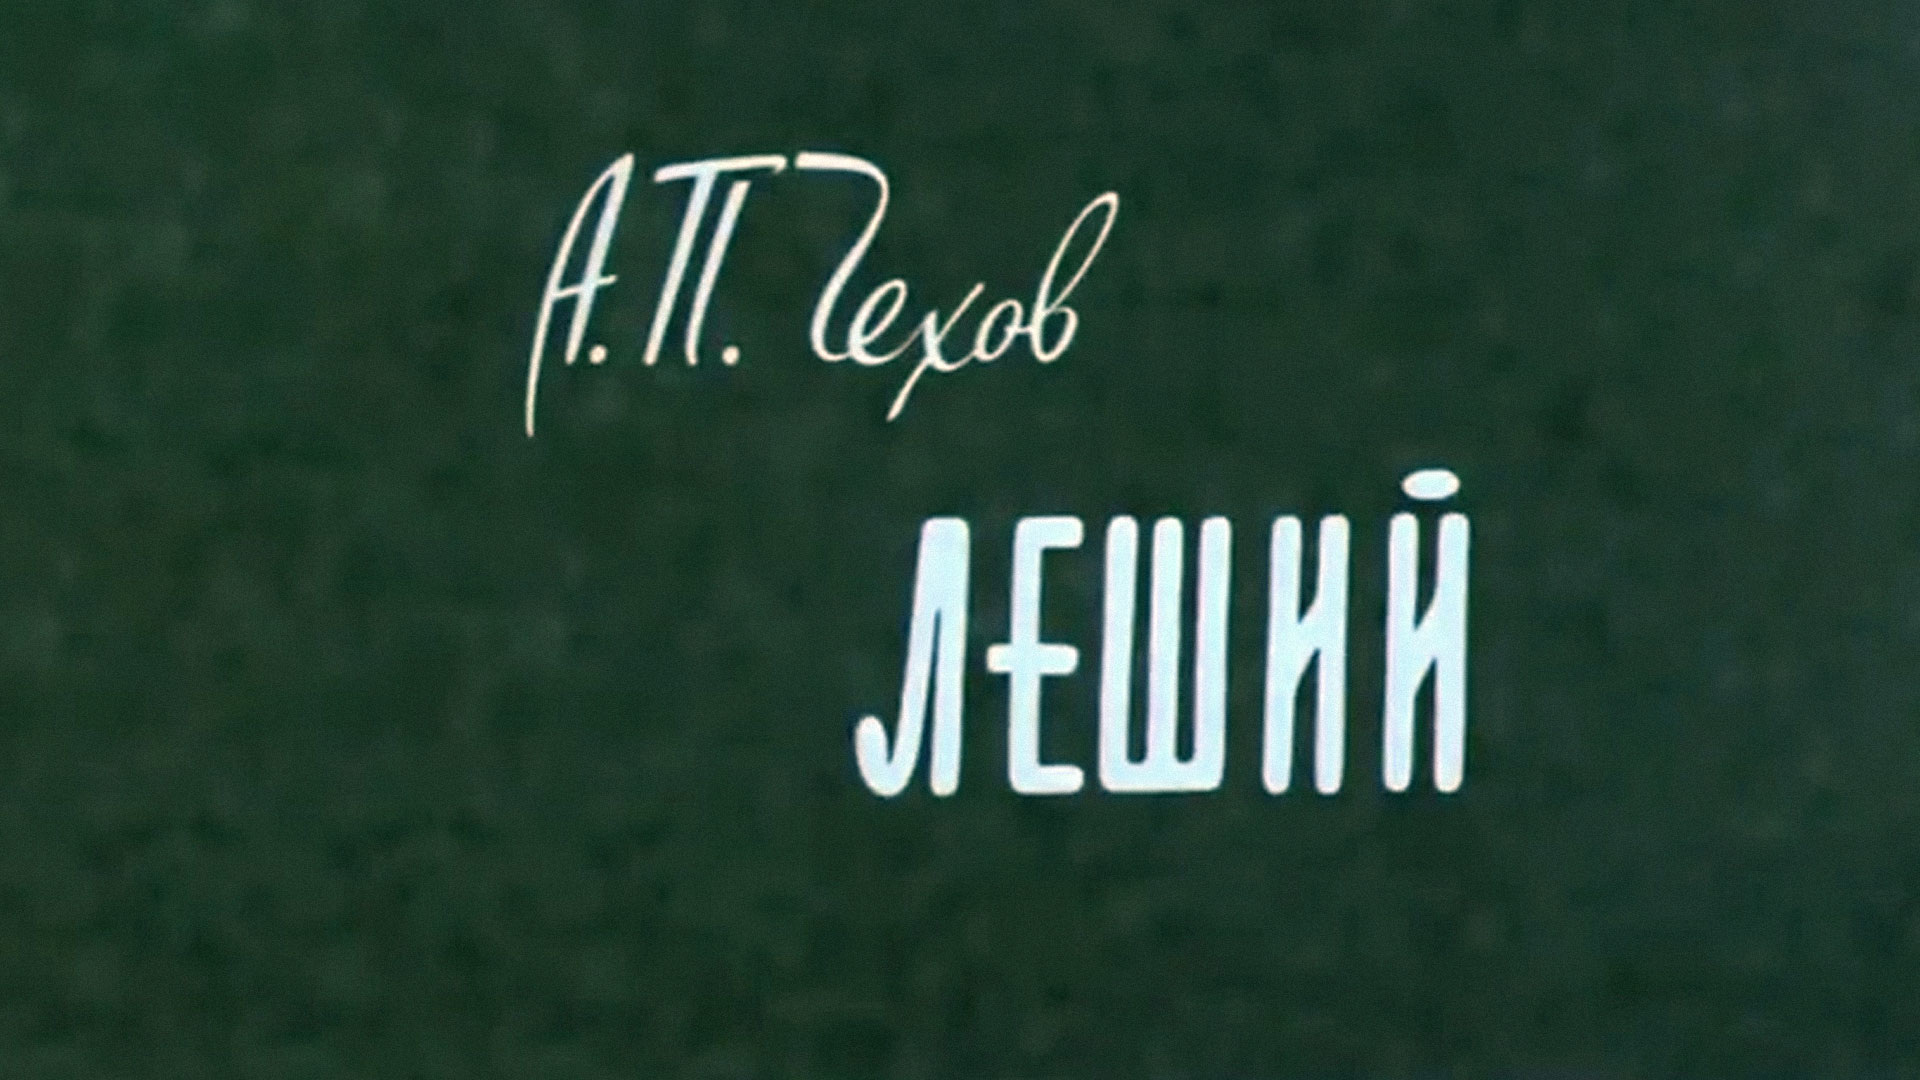 Леший (театр им. Евг. Вахтангова)